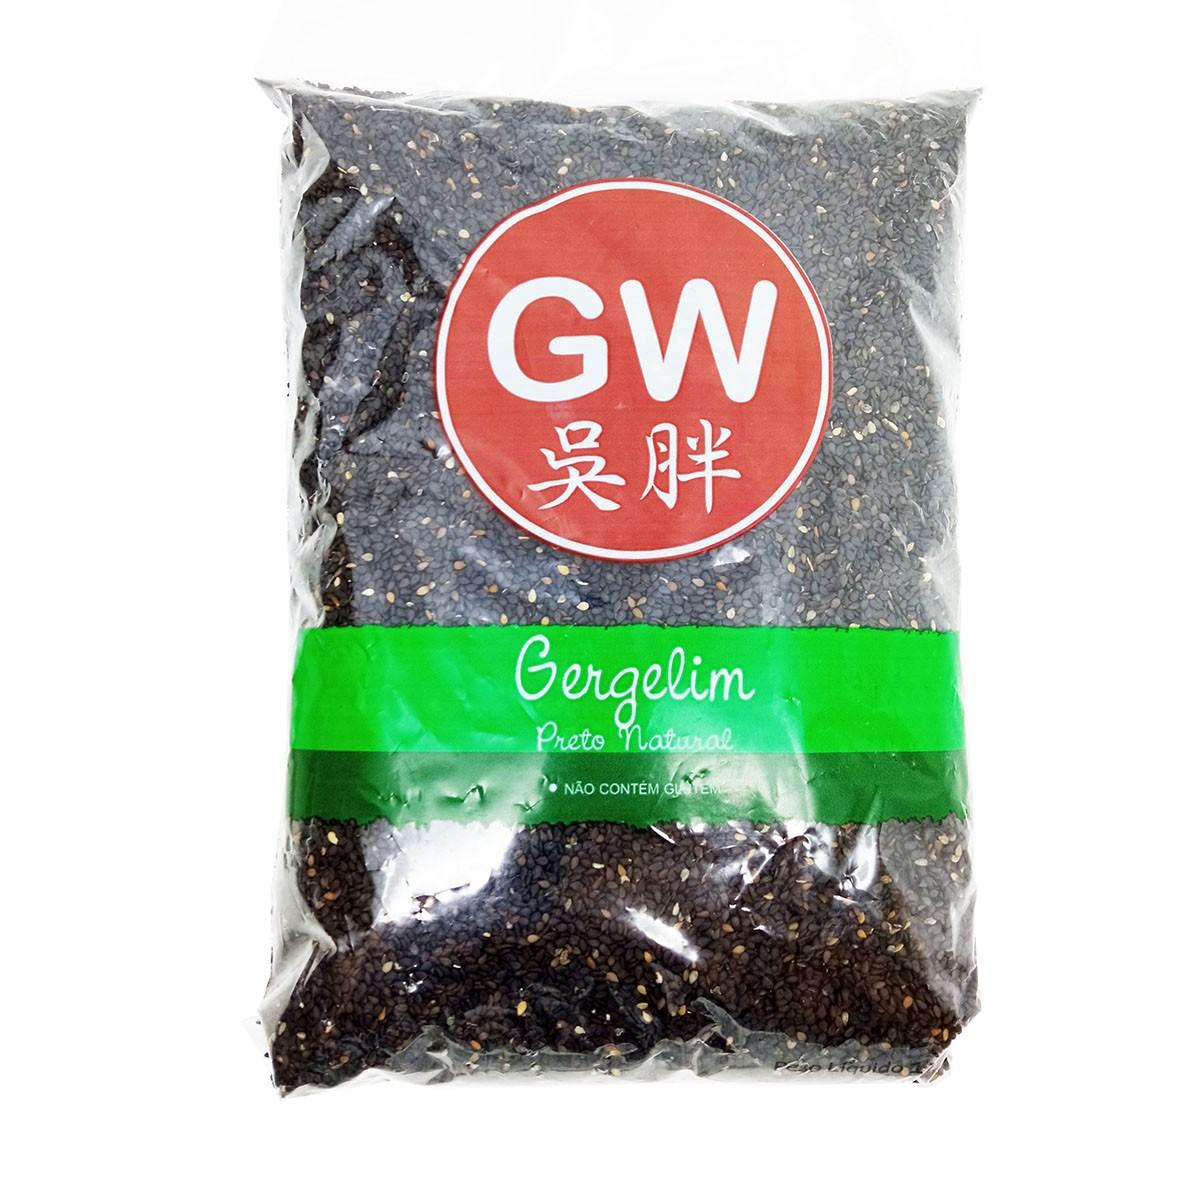 Gergelim Preto Natural 1kg - GW